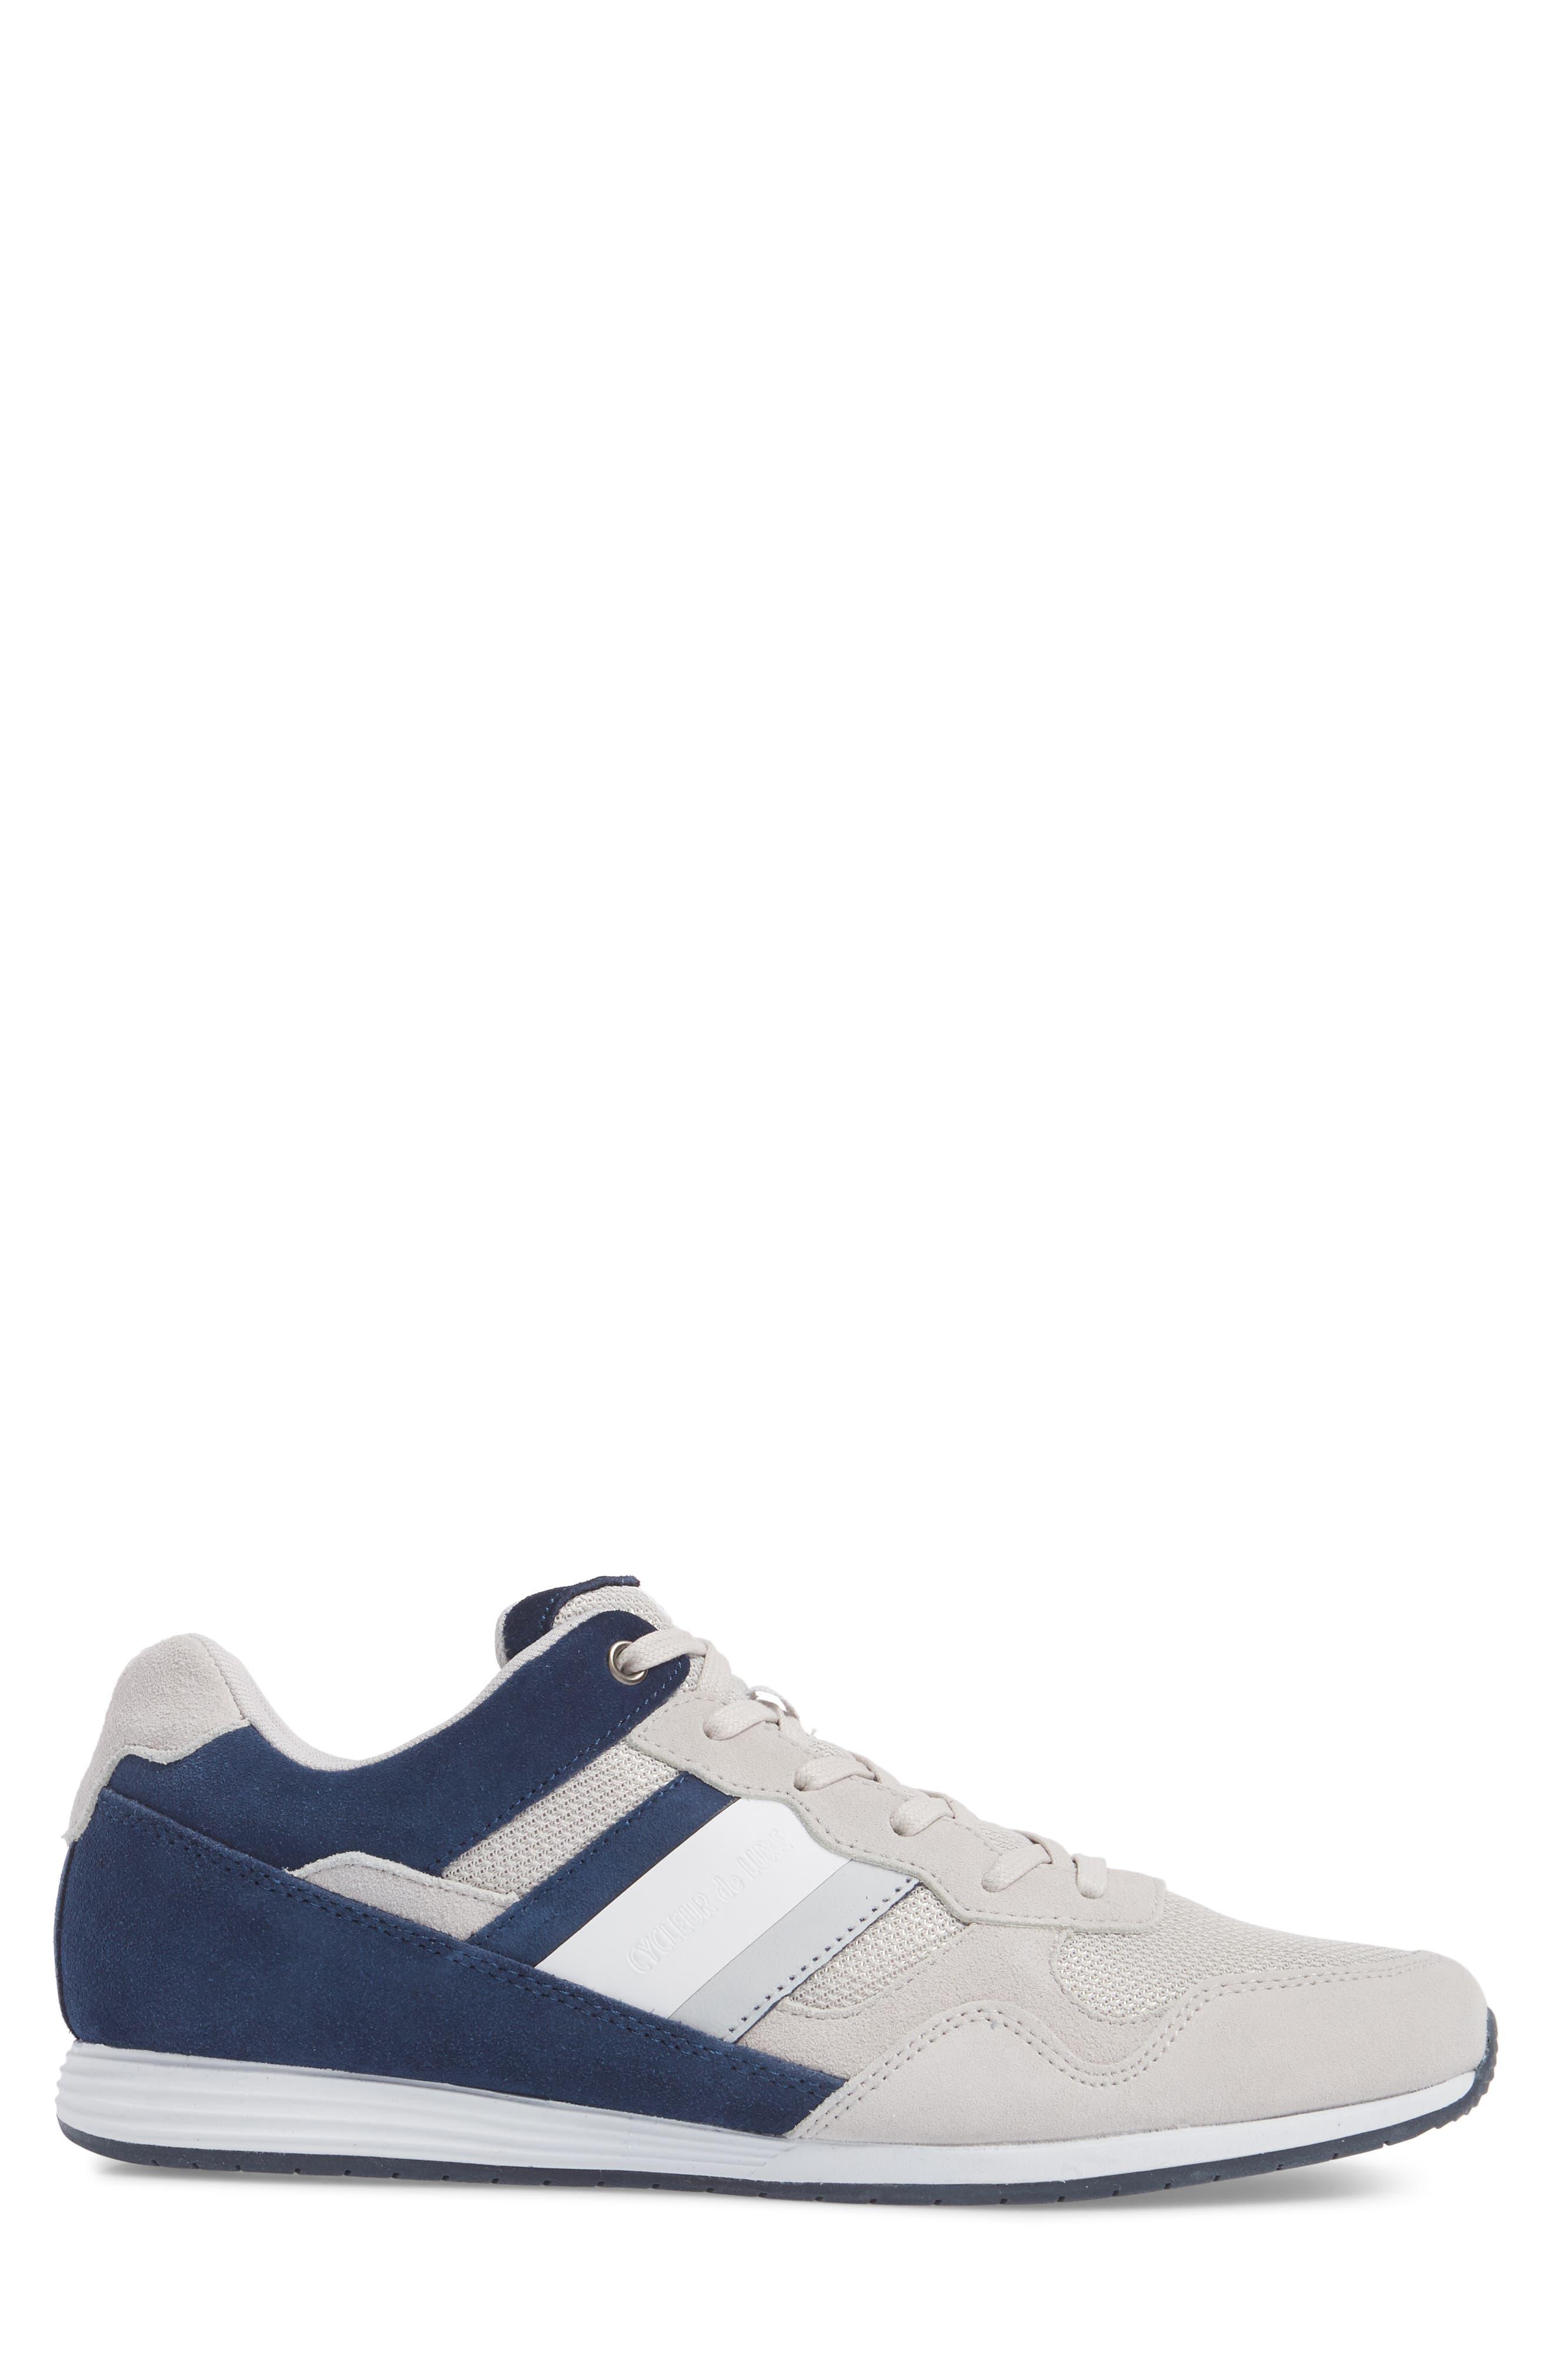 Scarpo Low Top Sneaker,                             Alternate thumbnail 3, color,                             020